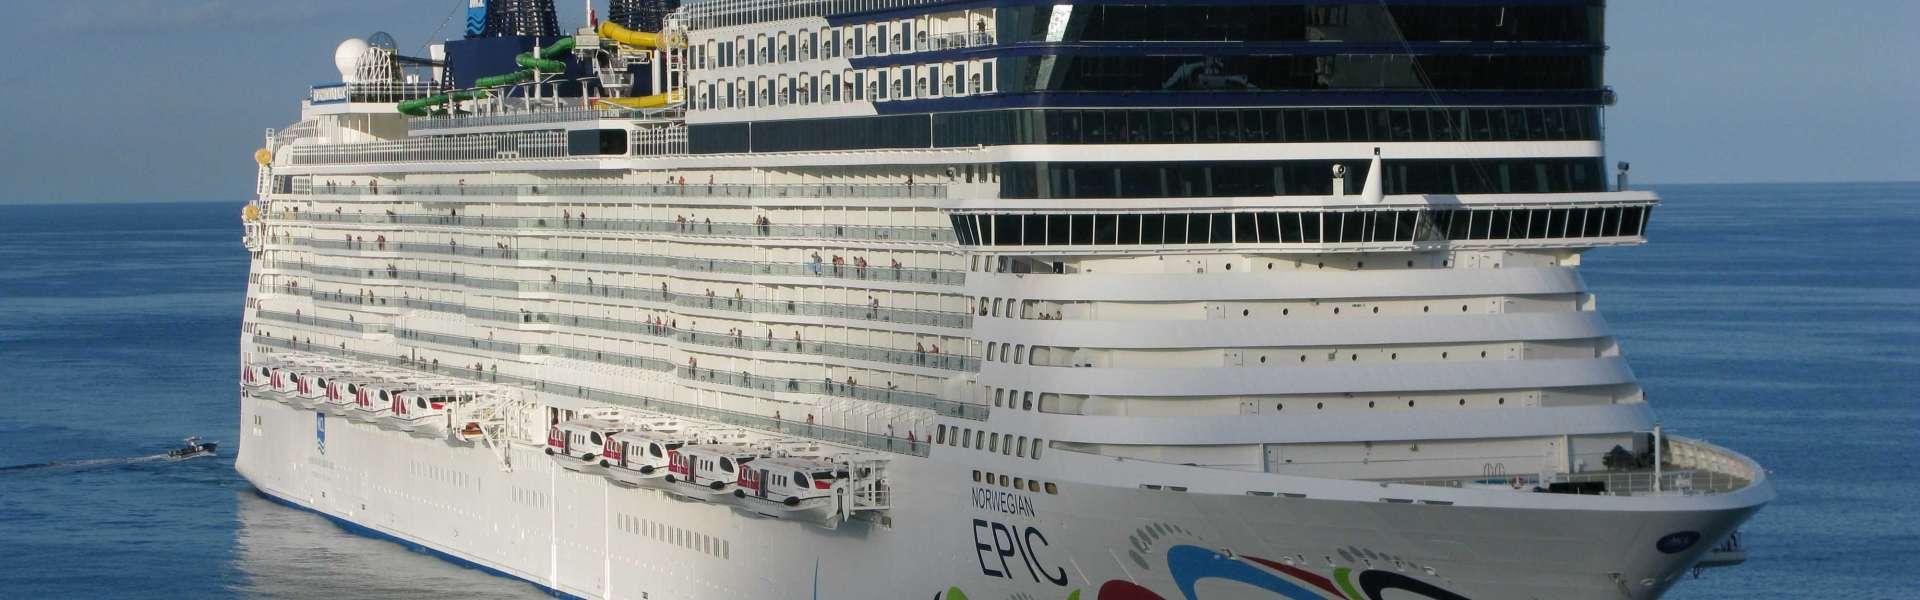 Croaziera 2019 - Mediterana De Vest (Barcelona) - Norwegian Cruise Line - Norwegian Epic - 7 nopti